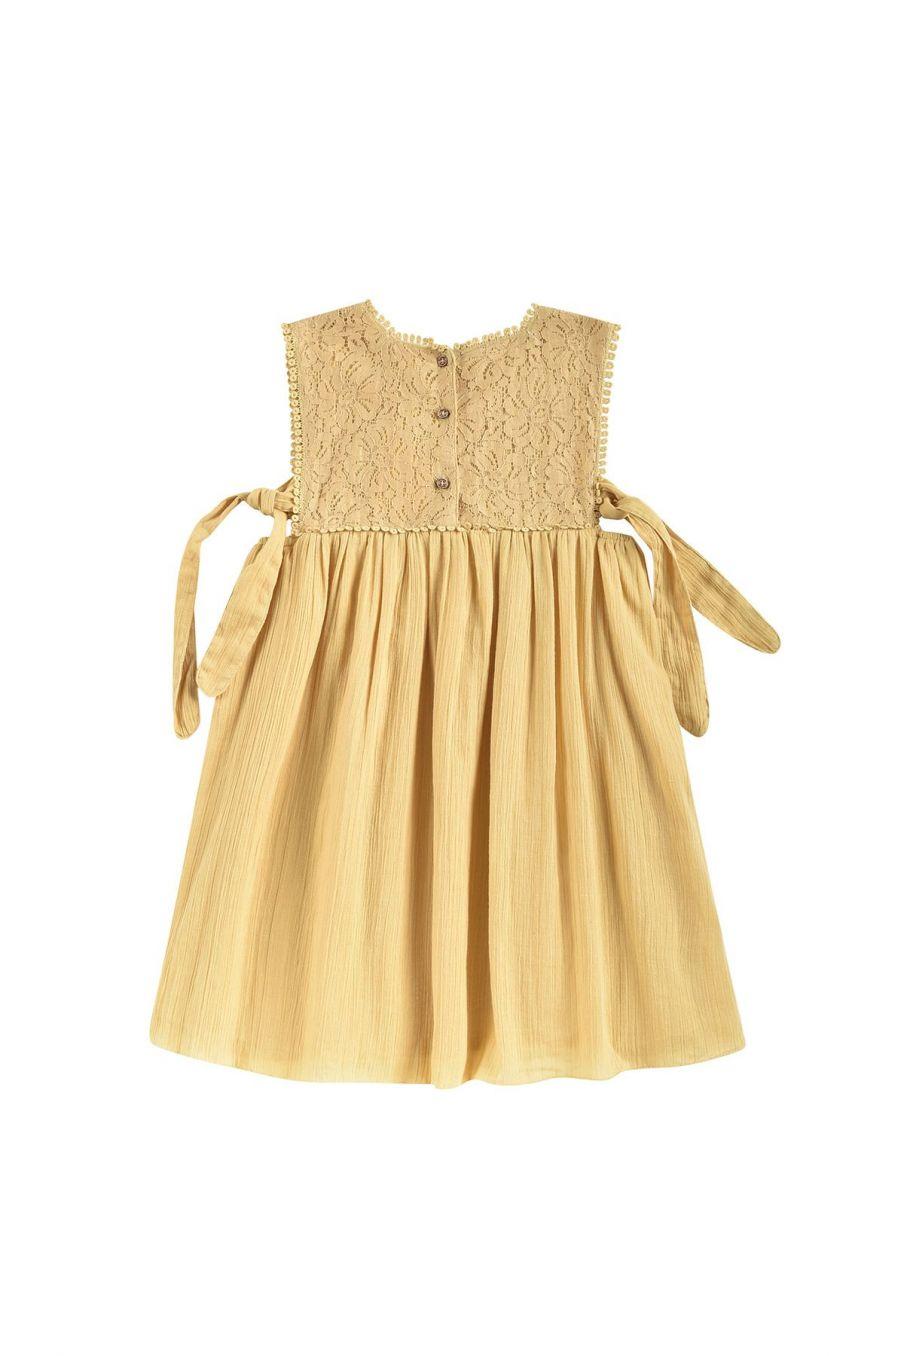 boheme chic vintage robe fille paolina soft honey